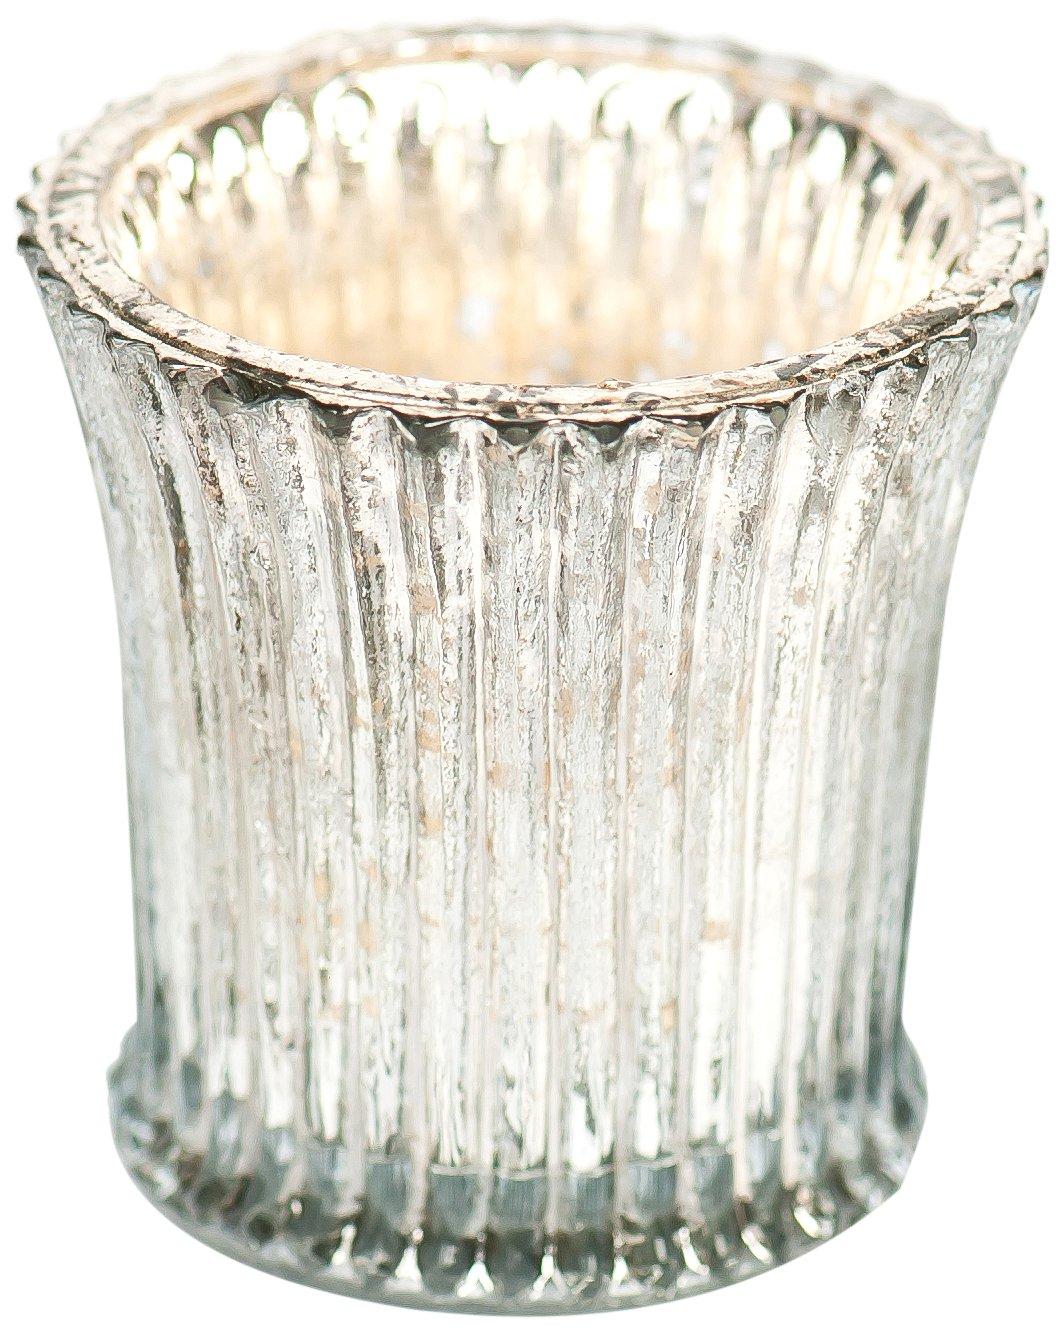 Insideretail TLV025MM72 Wedding Tea Light Holders: Vintage Fluted Glass Votives - Set of 72